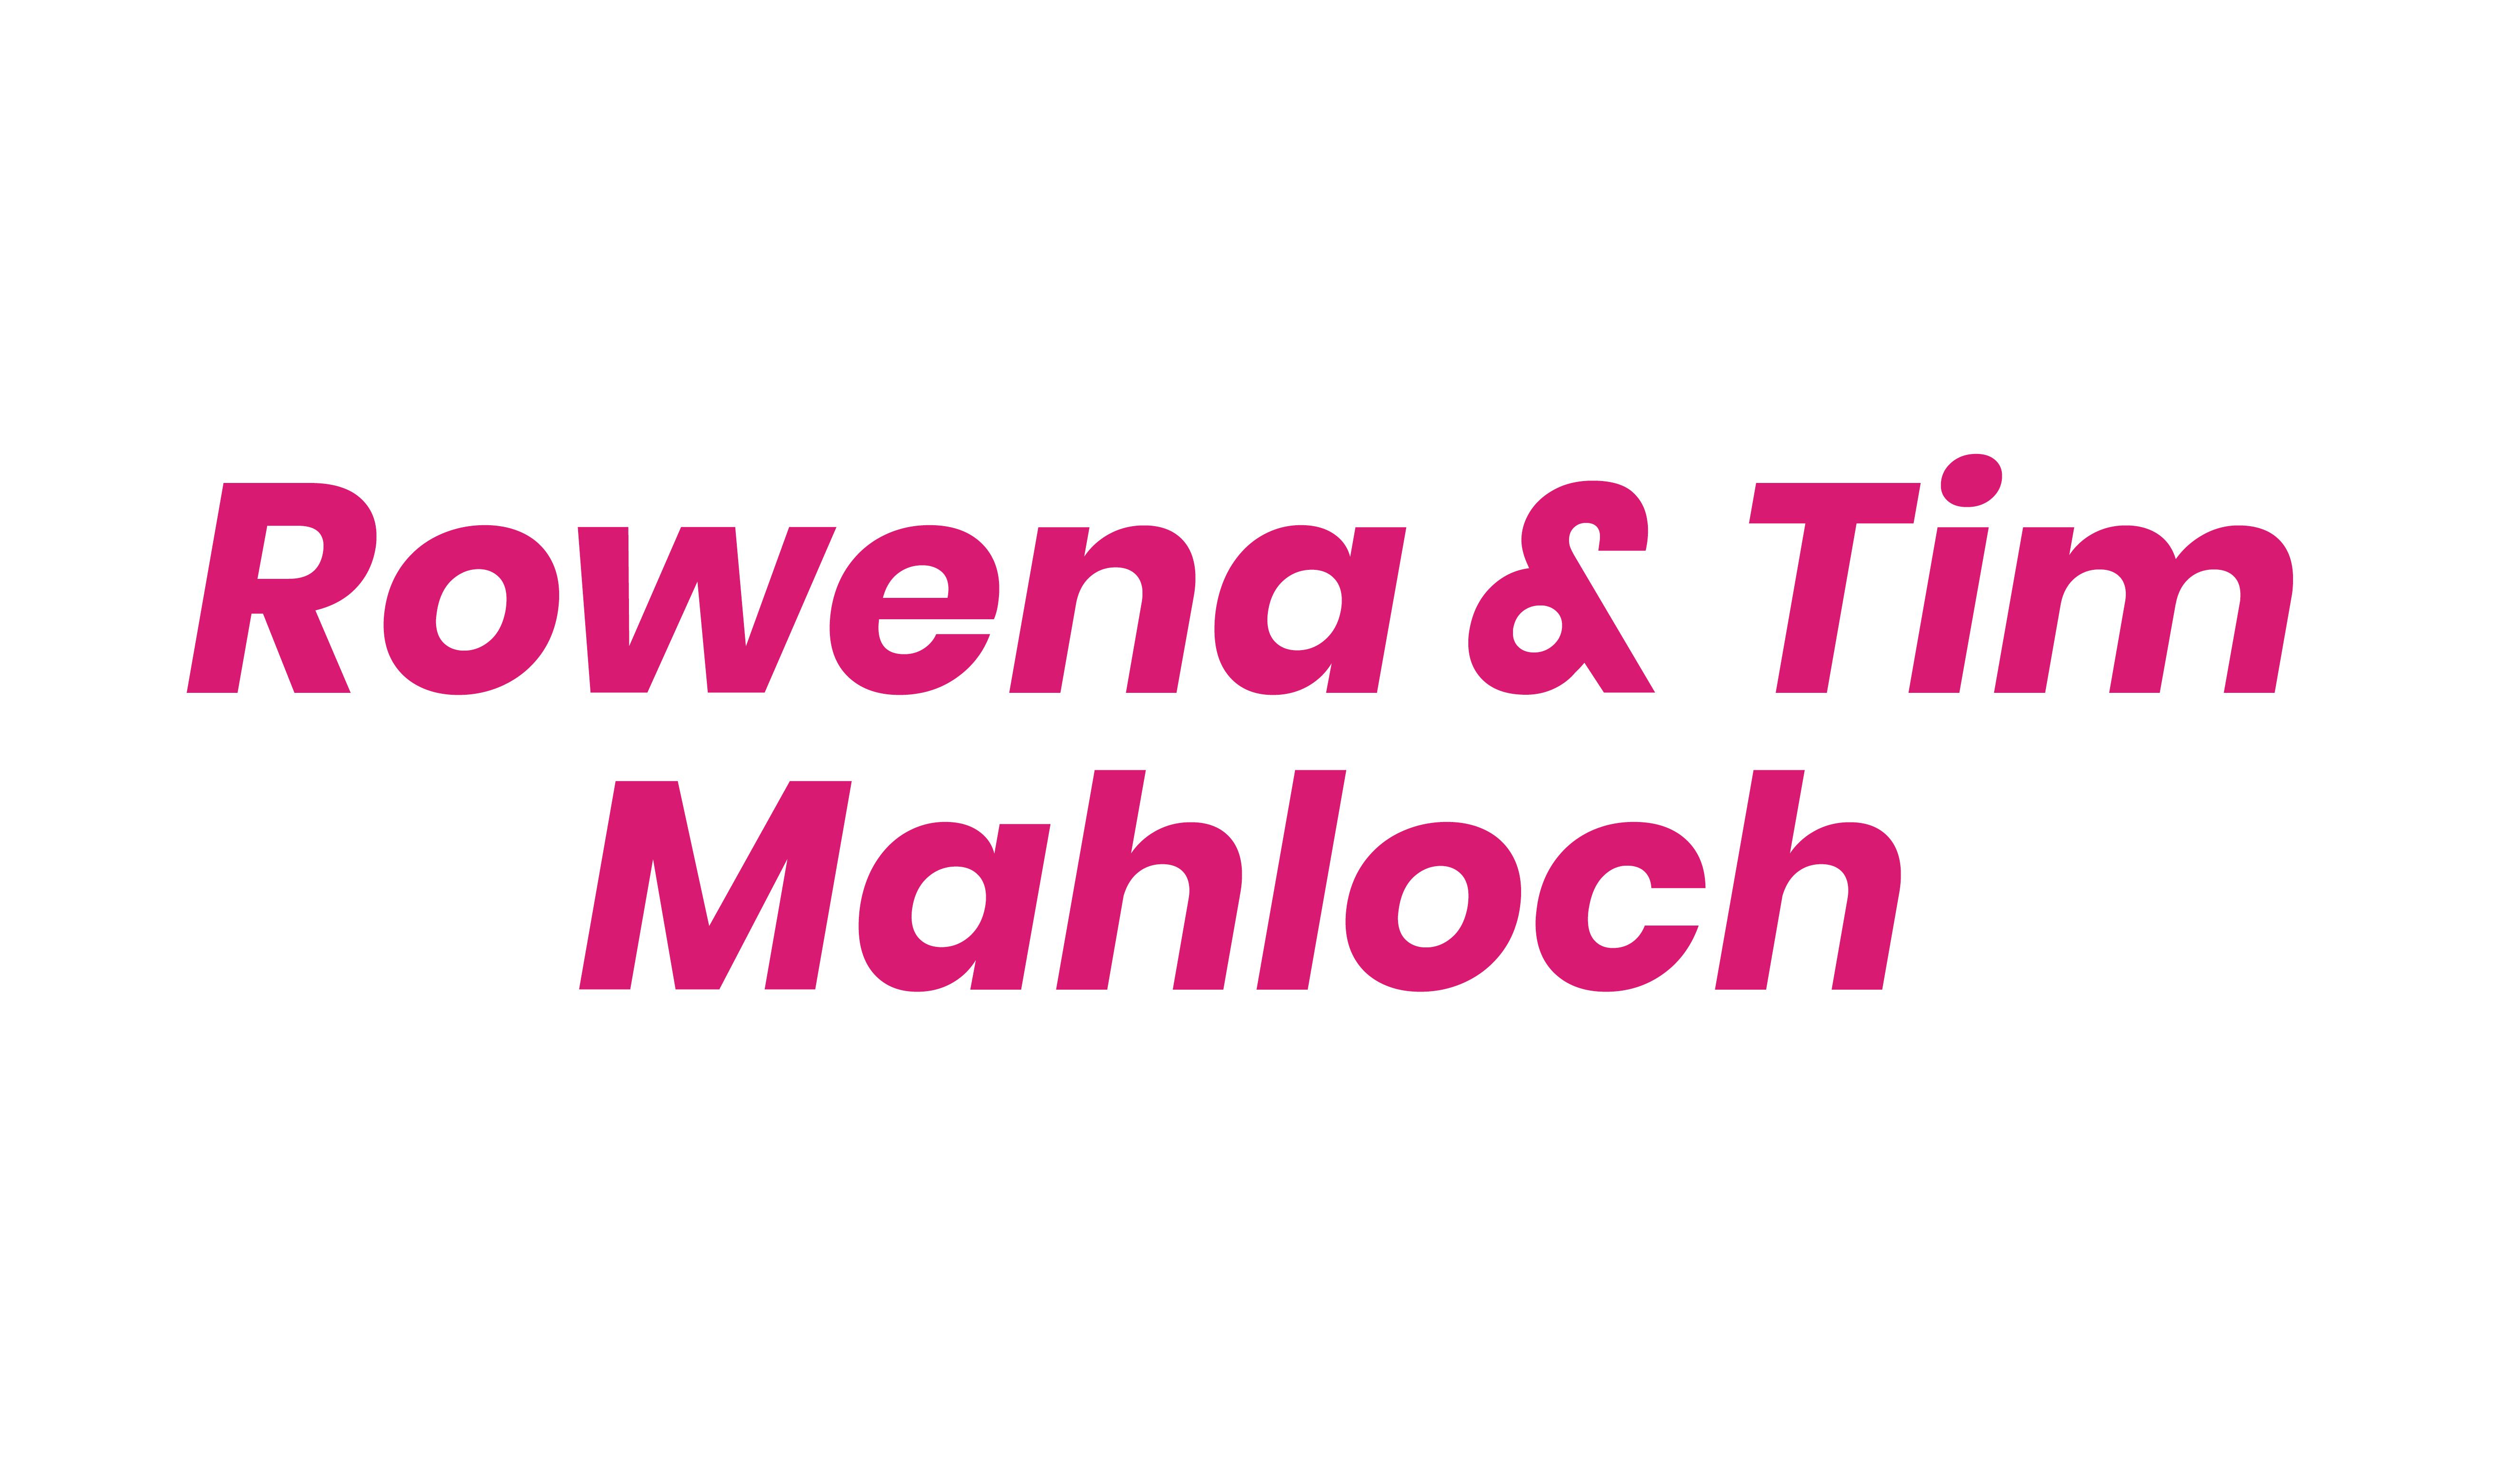 Rowena & Tim Mahloch